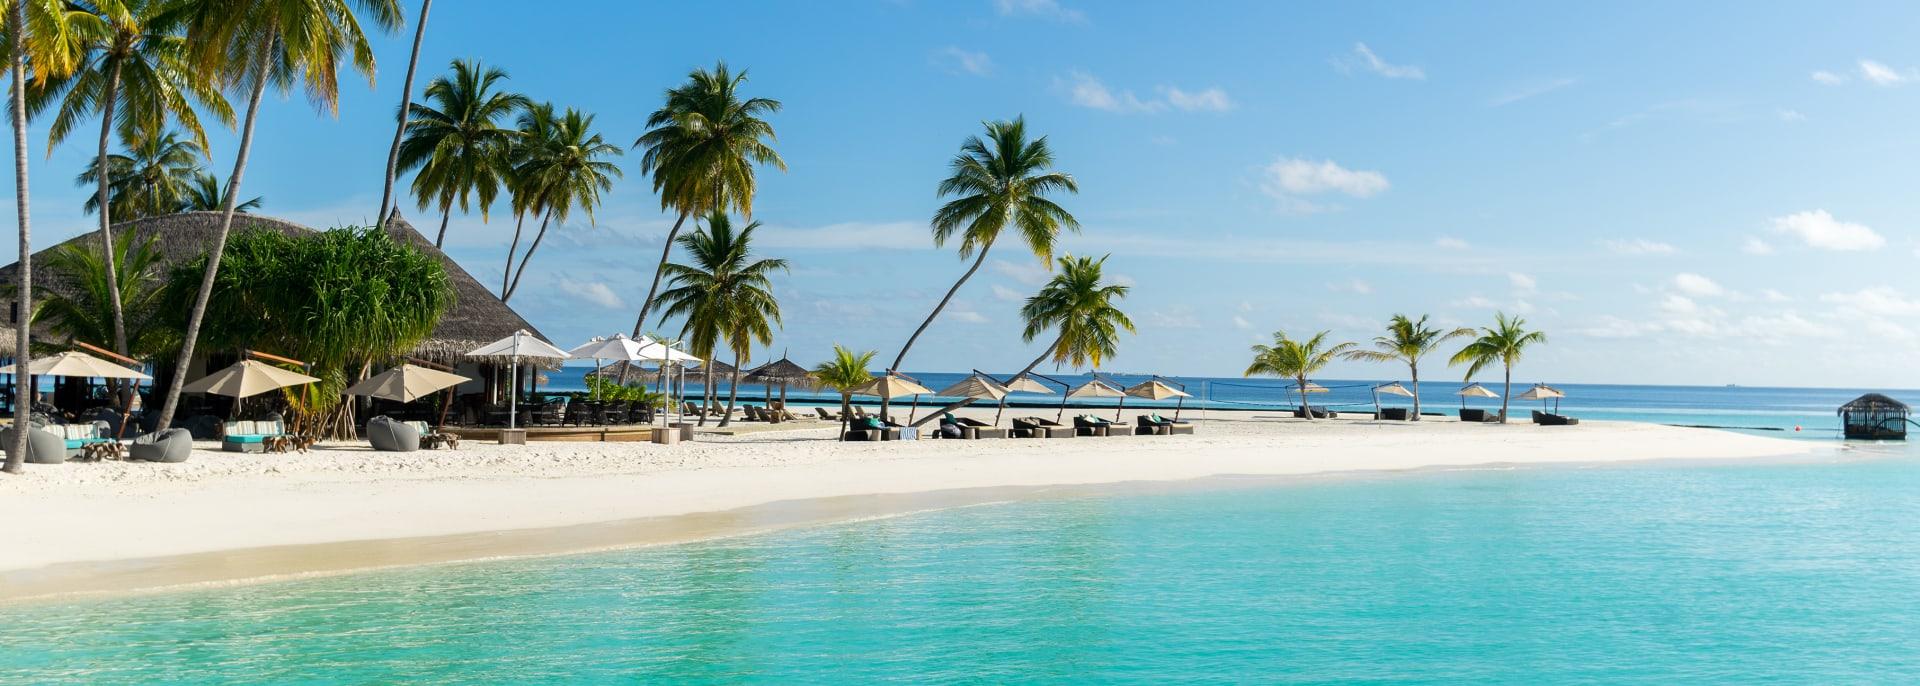 Nord nilandhe atoll, Malediven